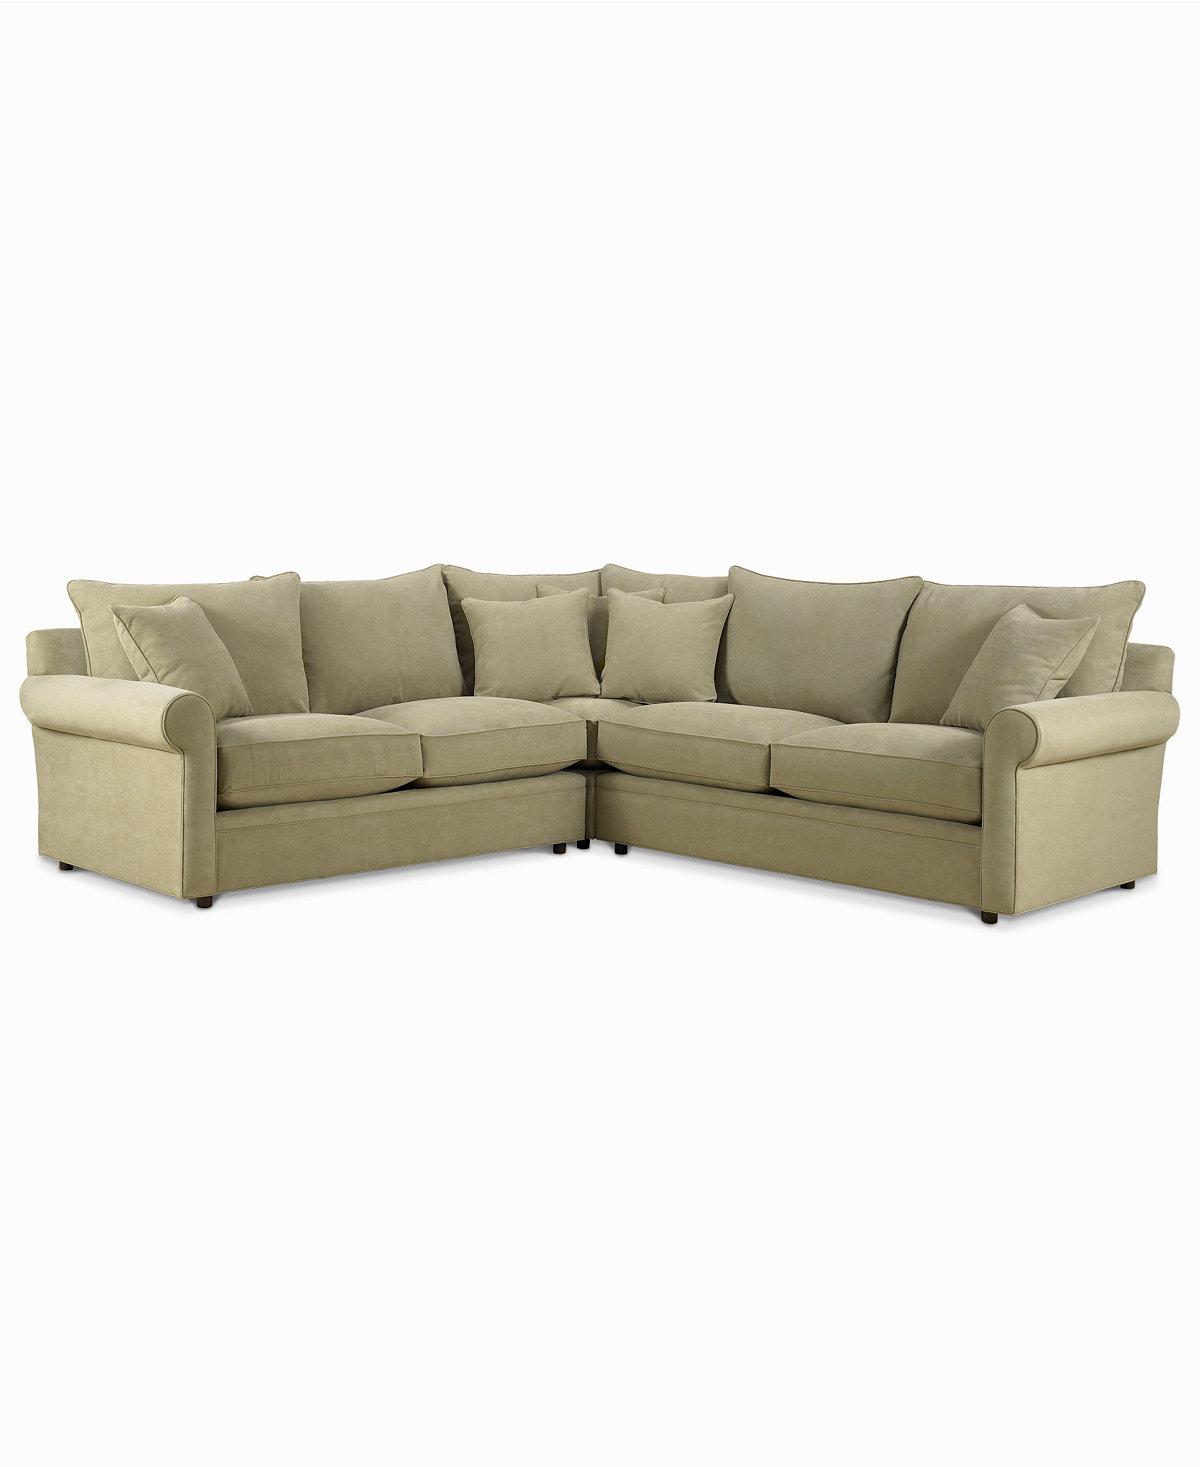 sectional sofas microfiber fabric off white doss 3 piece sofa